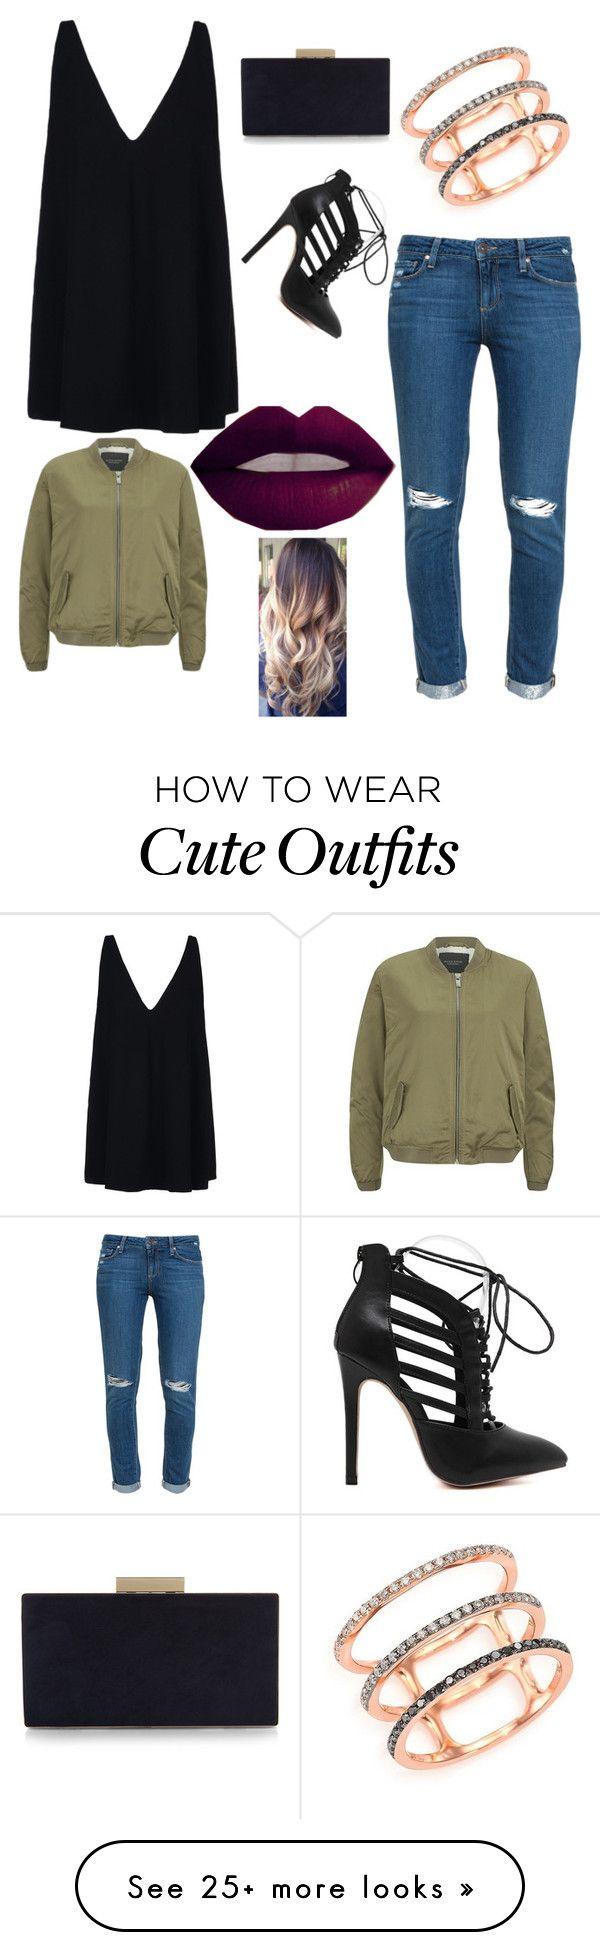 """cute outfits"" by cupackesandunicorns on Polyvore featuring Paige Denim, STELLA McCARTNEY, EF Collection, Monsoon, Maison Scotch, women's clothing, women's fashion, women, female and woman"